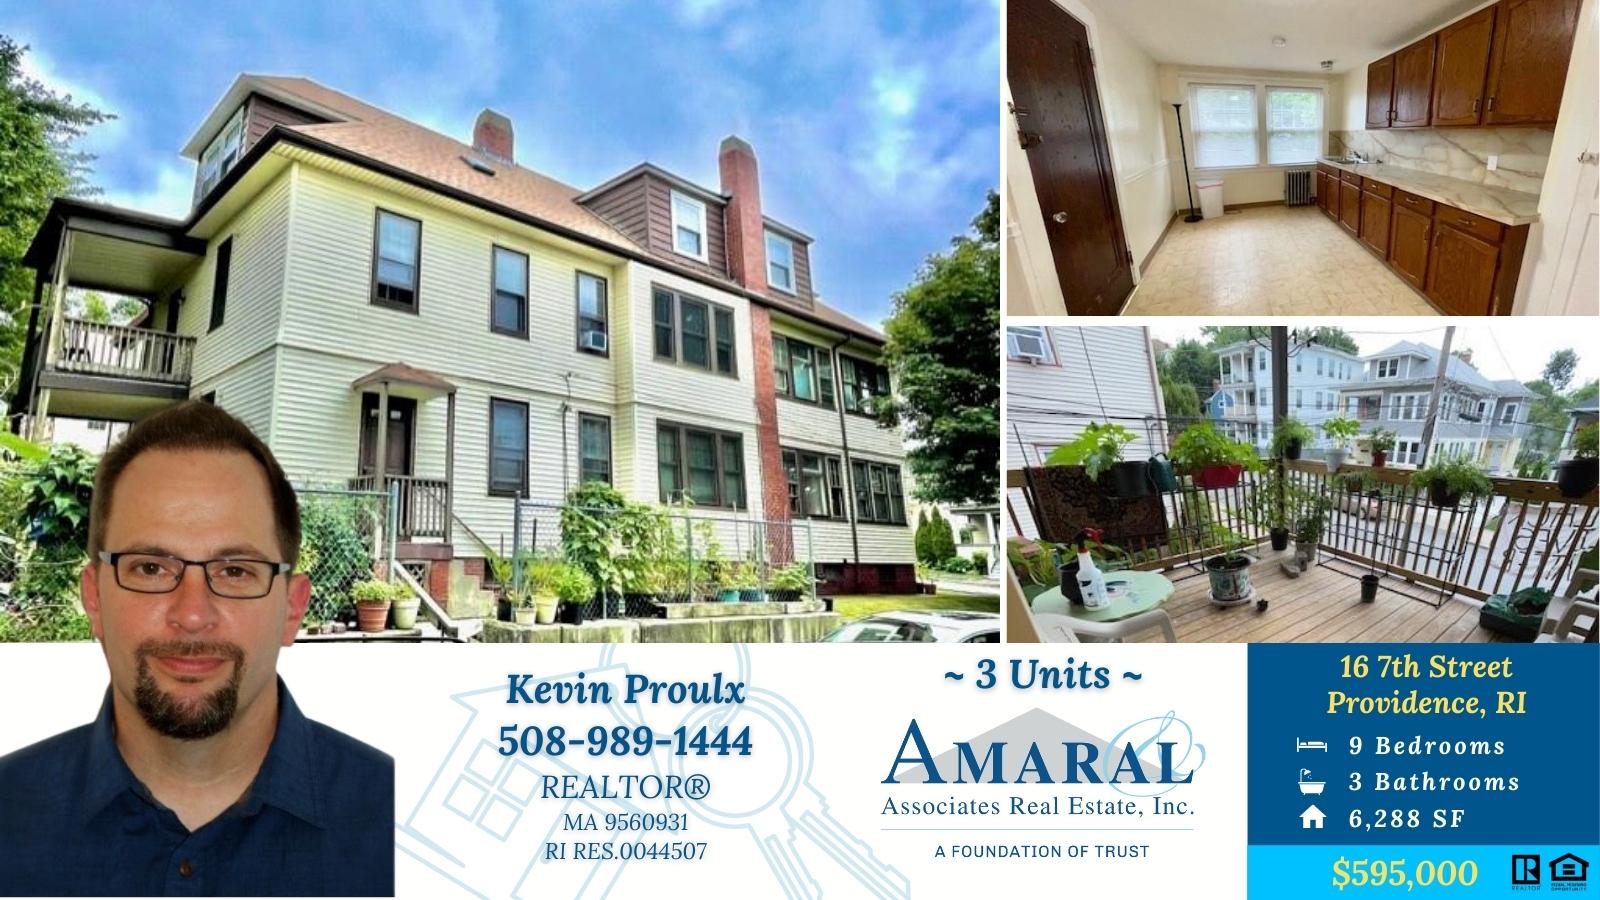 NEW LISTING ~ 16 7th Street, Providence, RI ~ $595,000